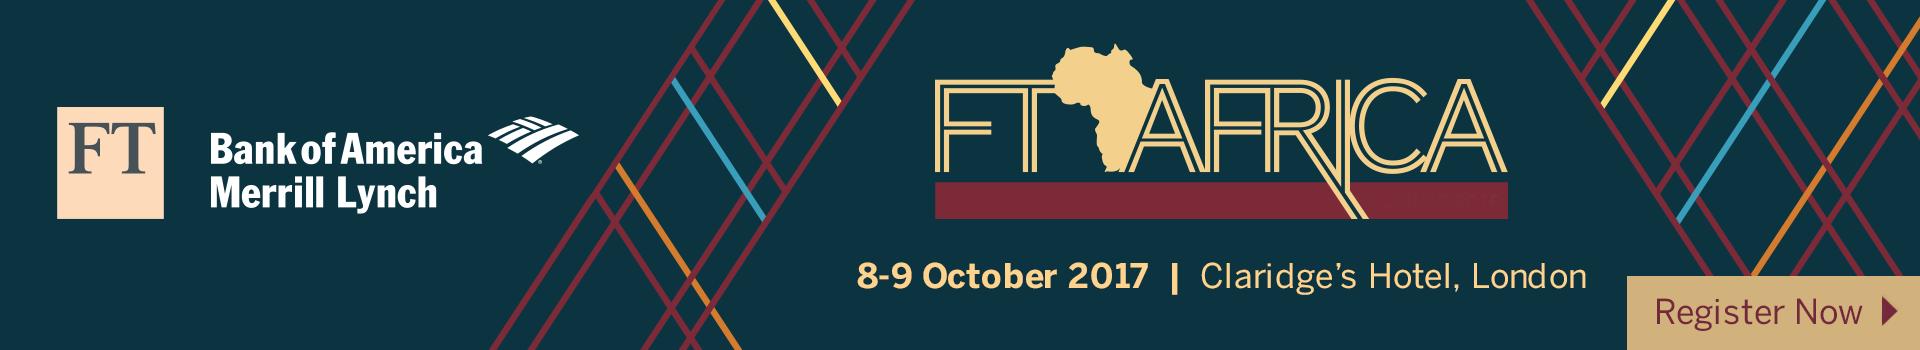 FT Africa Summit 2017 - London - 8 & 9 October